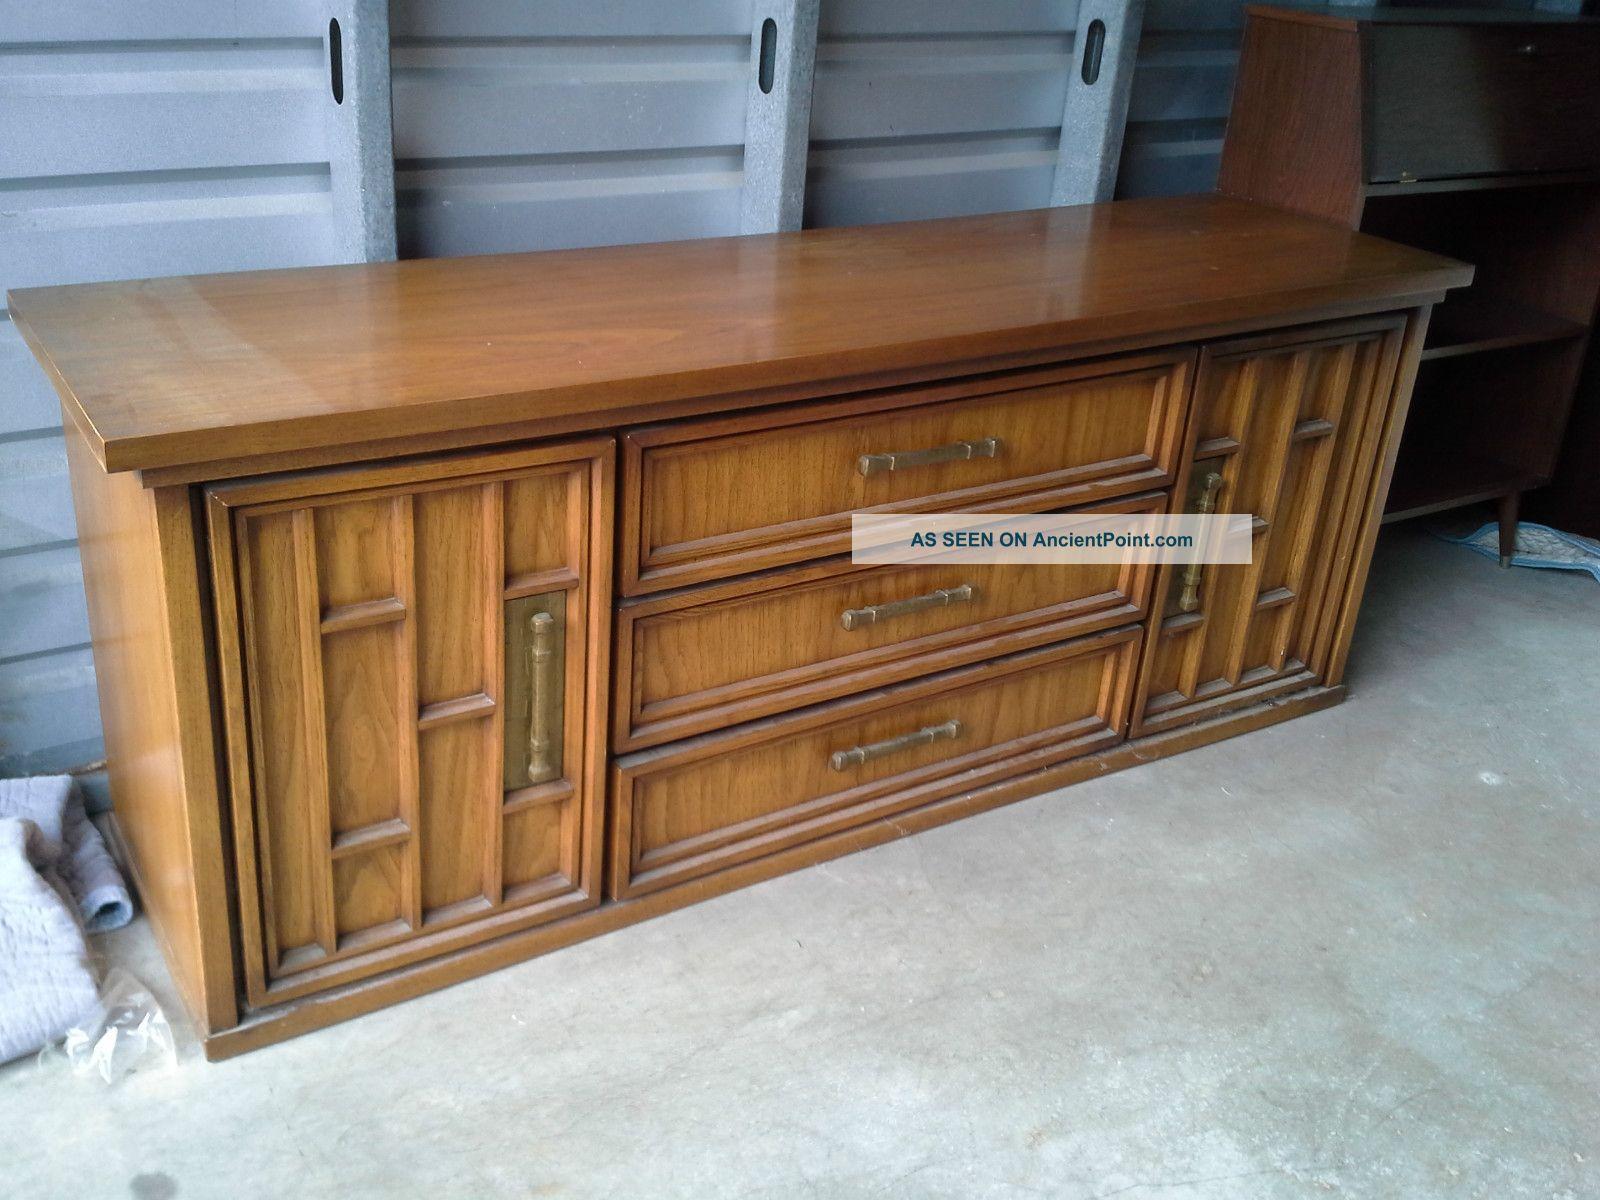 United Furniture Corporation Vintage Credenza Post-1950 photo